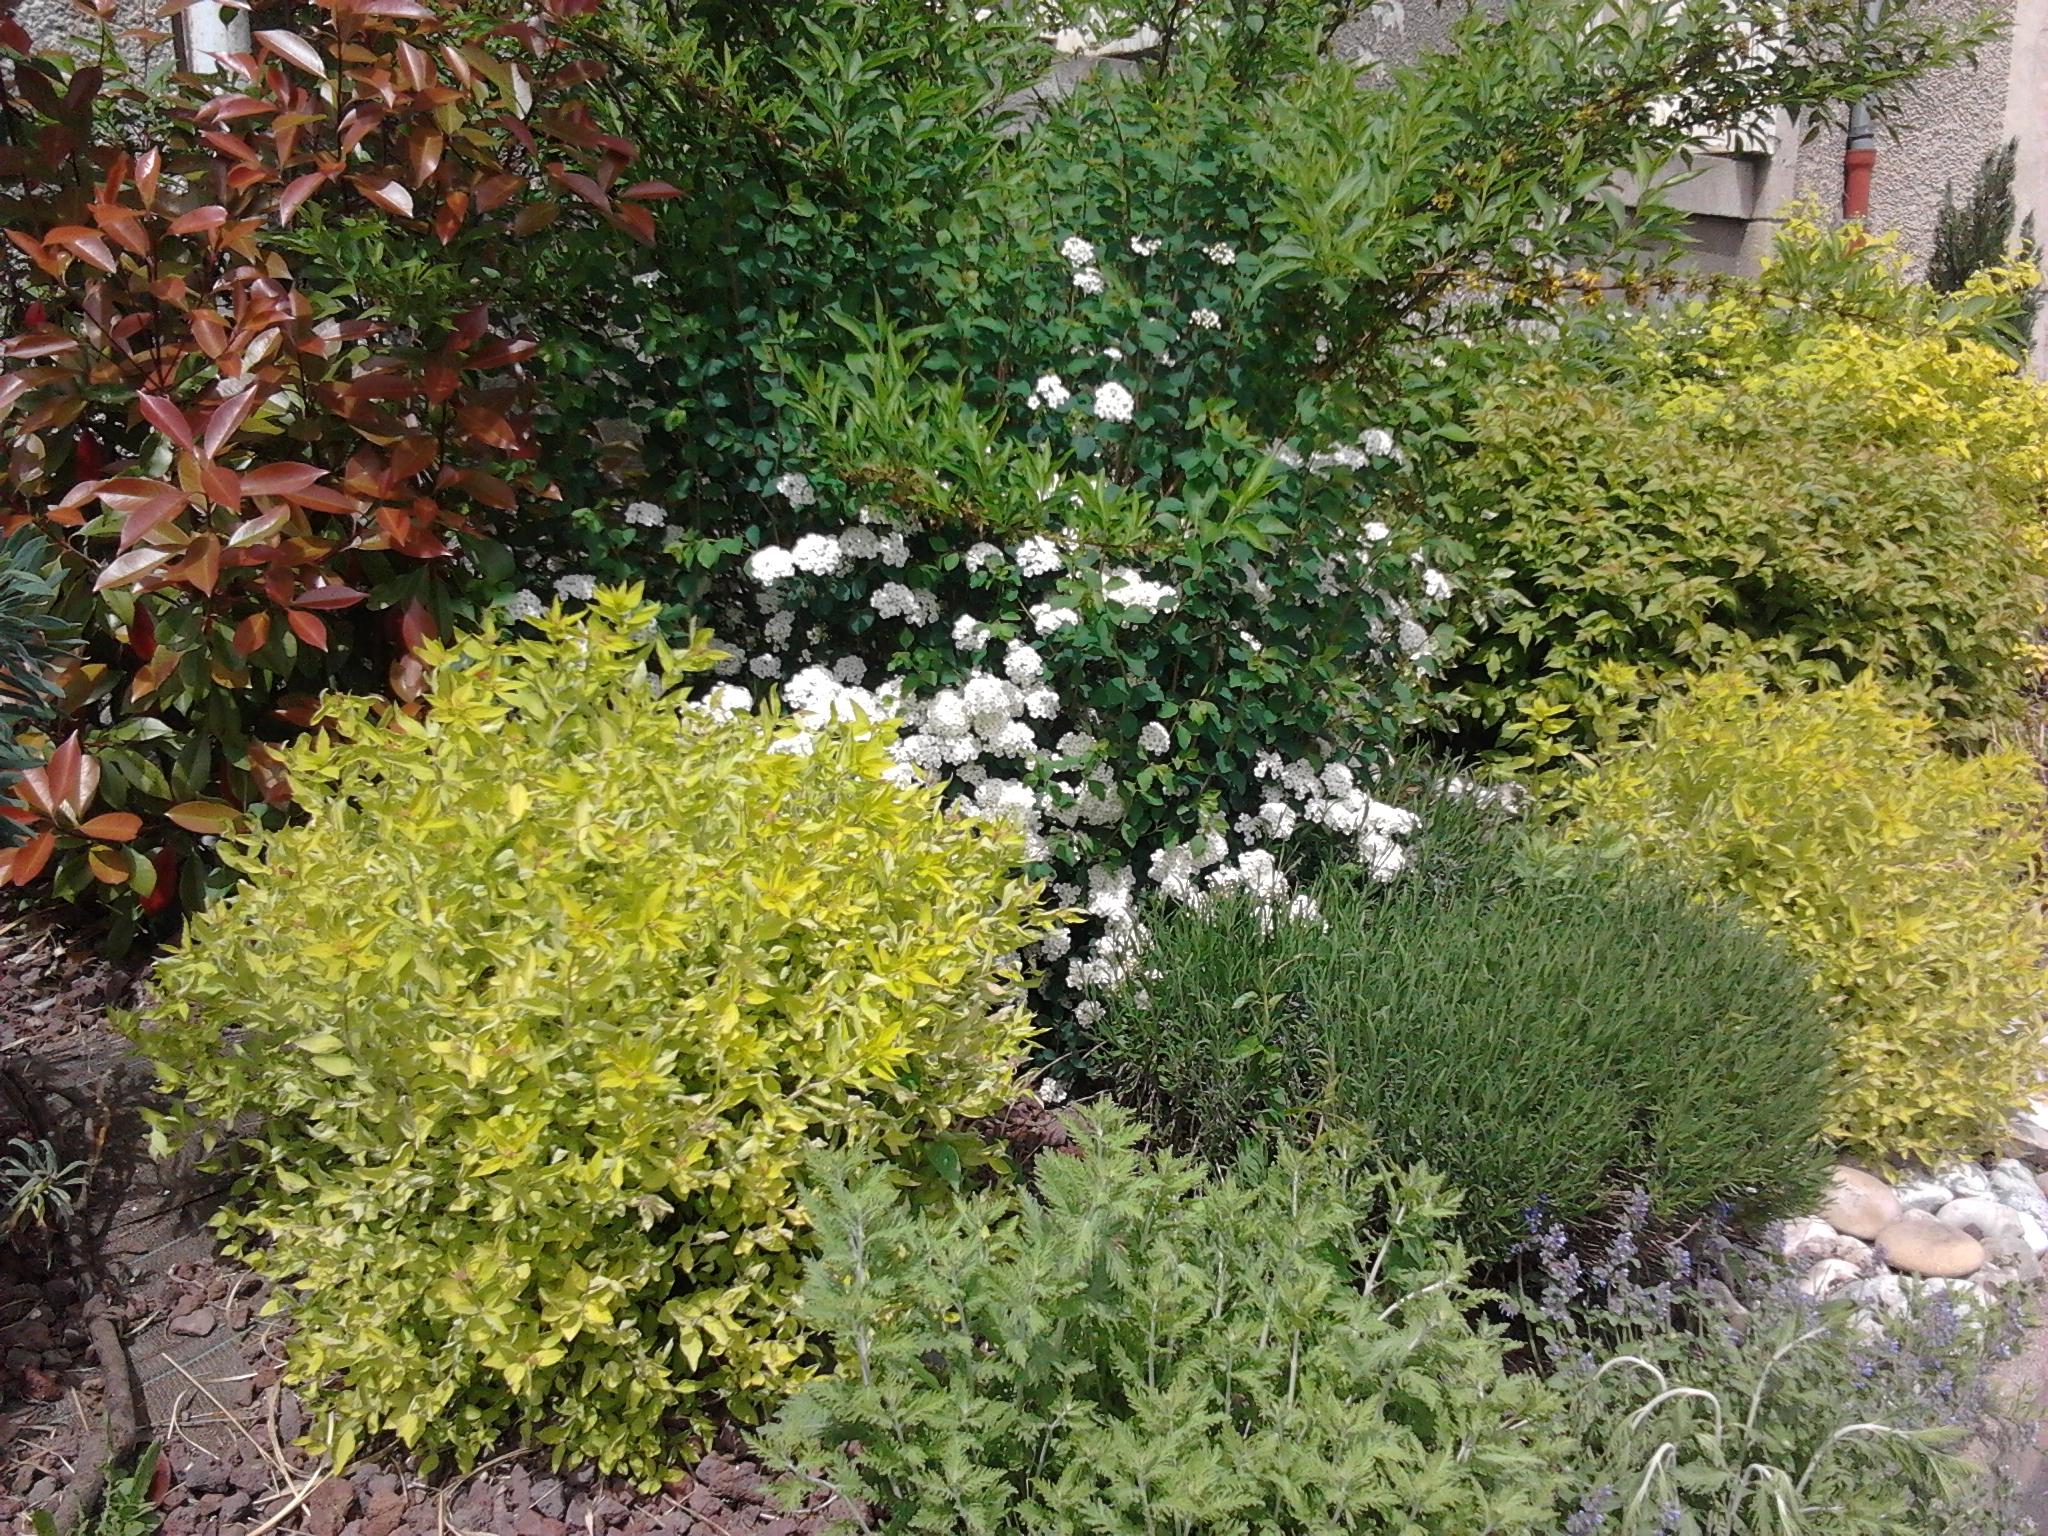 Cr er votre jardin des 5 sens jardinier conseil for Creer massif jardin